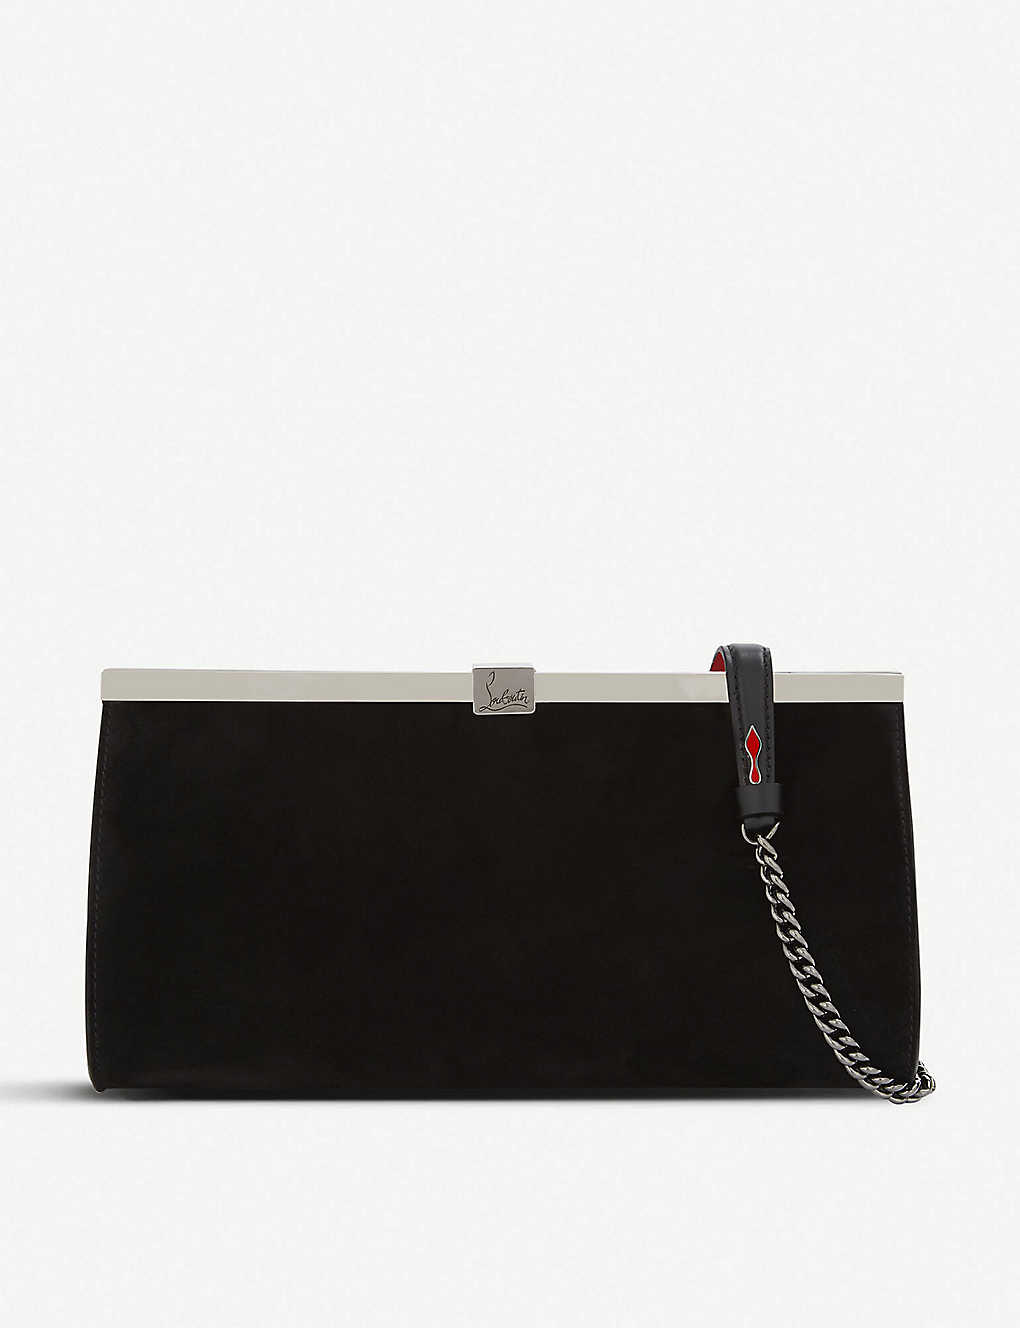 Christian Louboutin Clutch Palmette clutch veau velours black